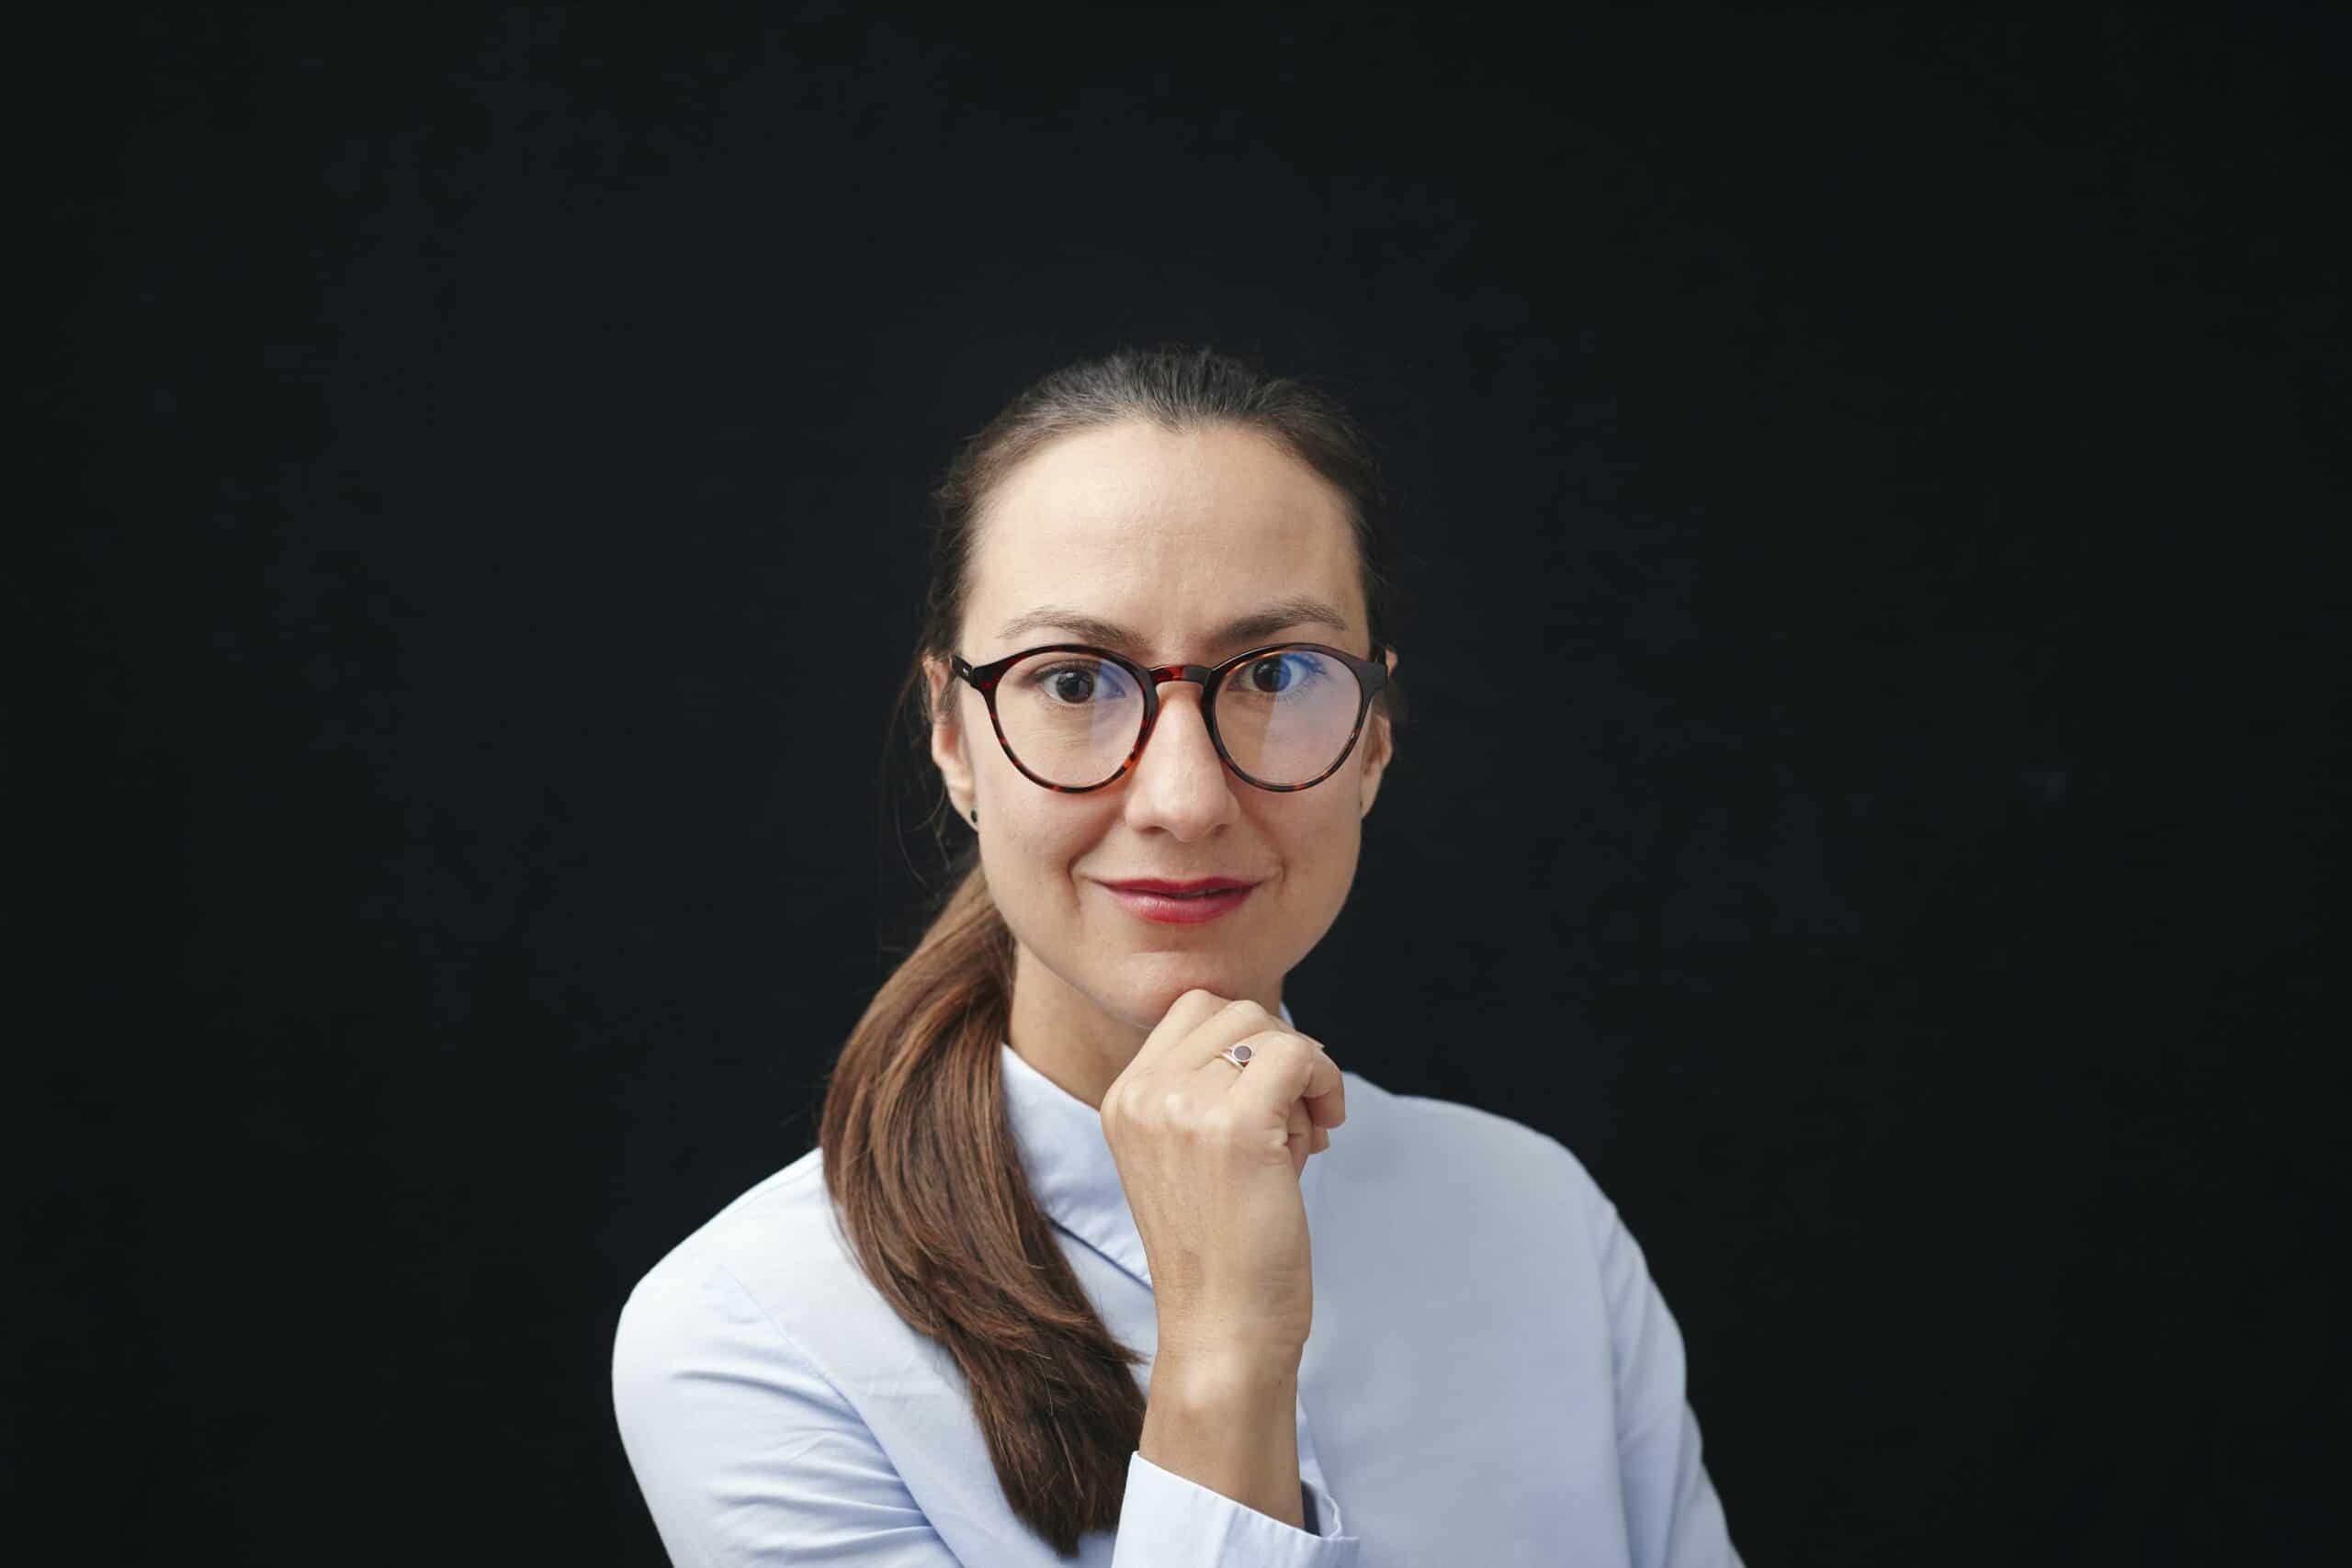 Agata Bereś, Platige Image